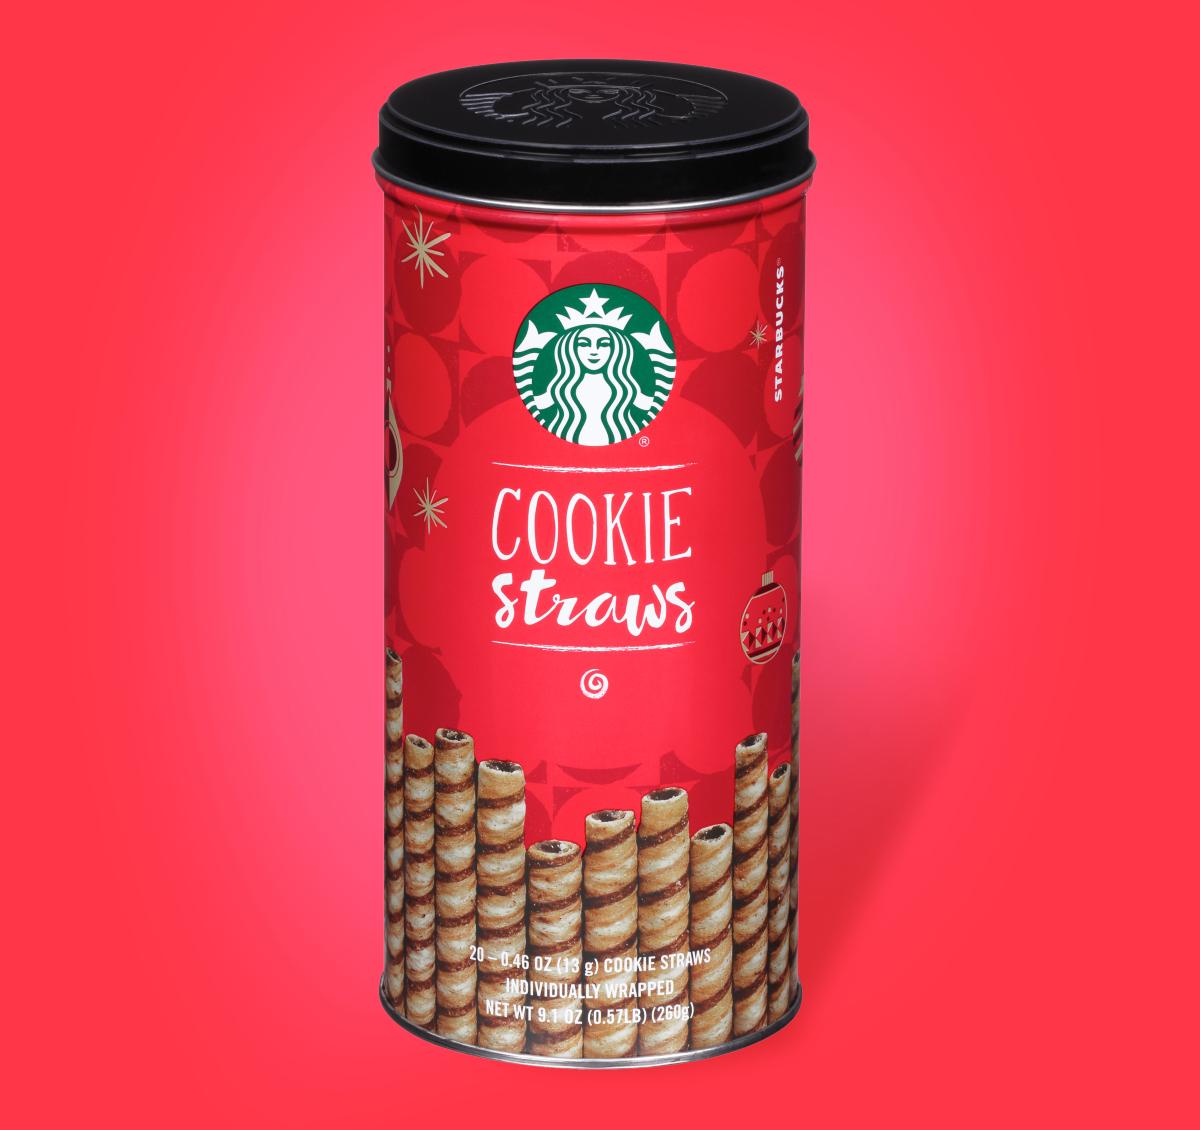 Starbucks Holiday Cookie Straws